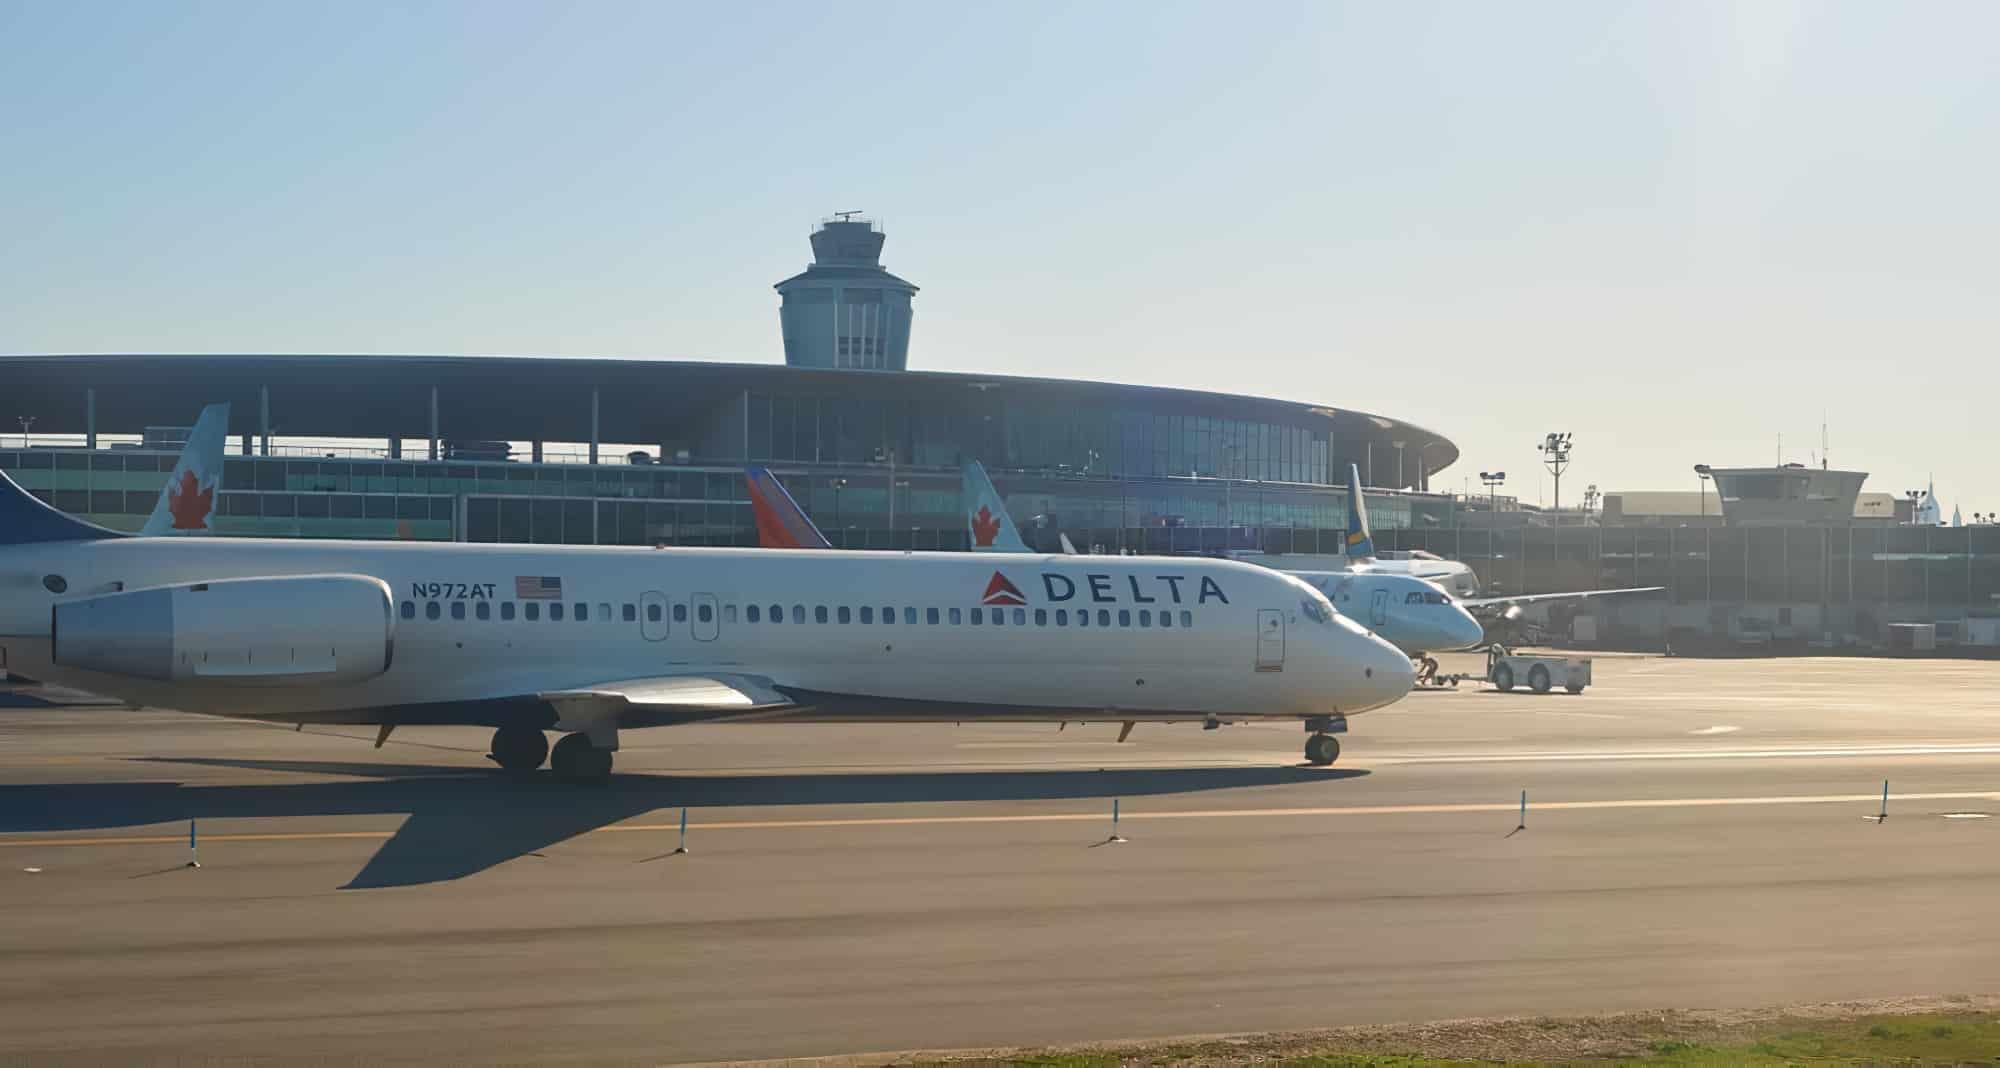 Aéroport de New York LaGuardia